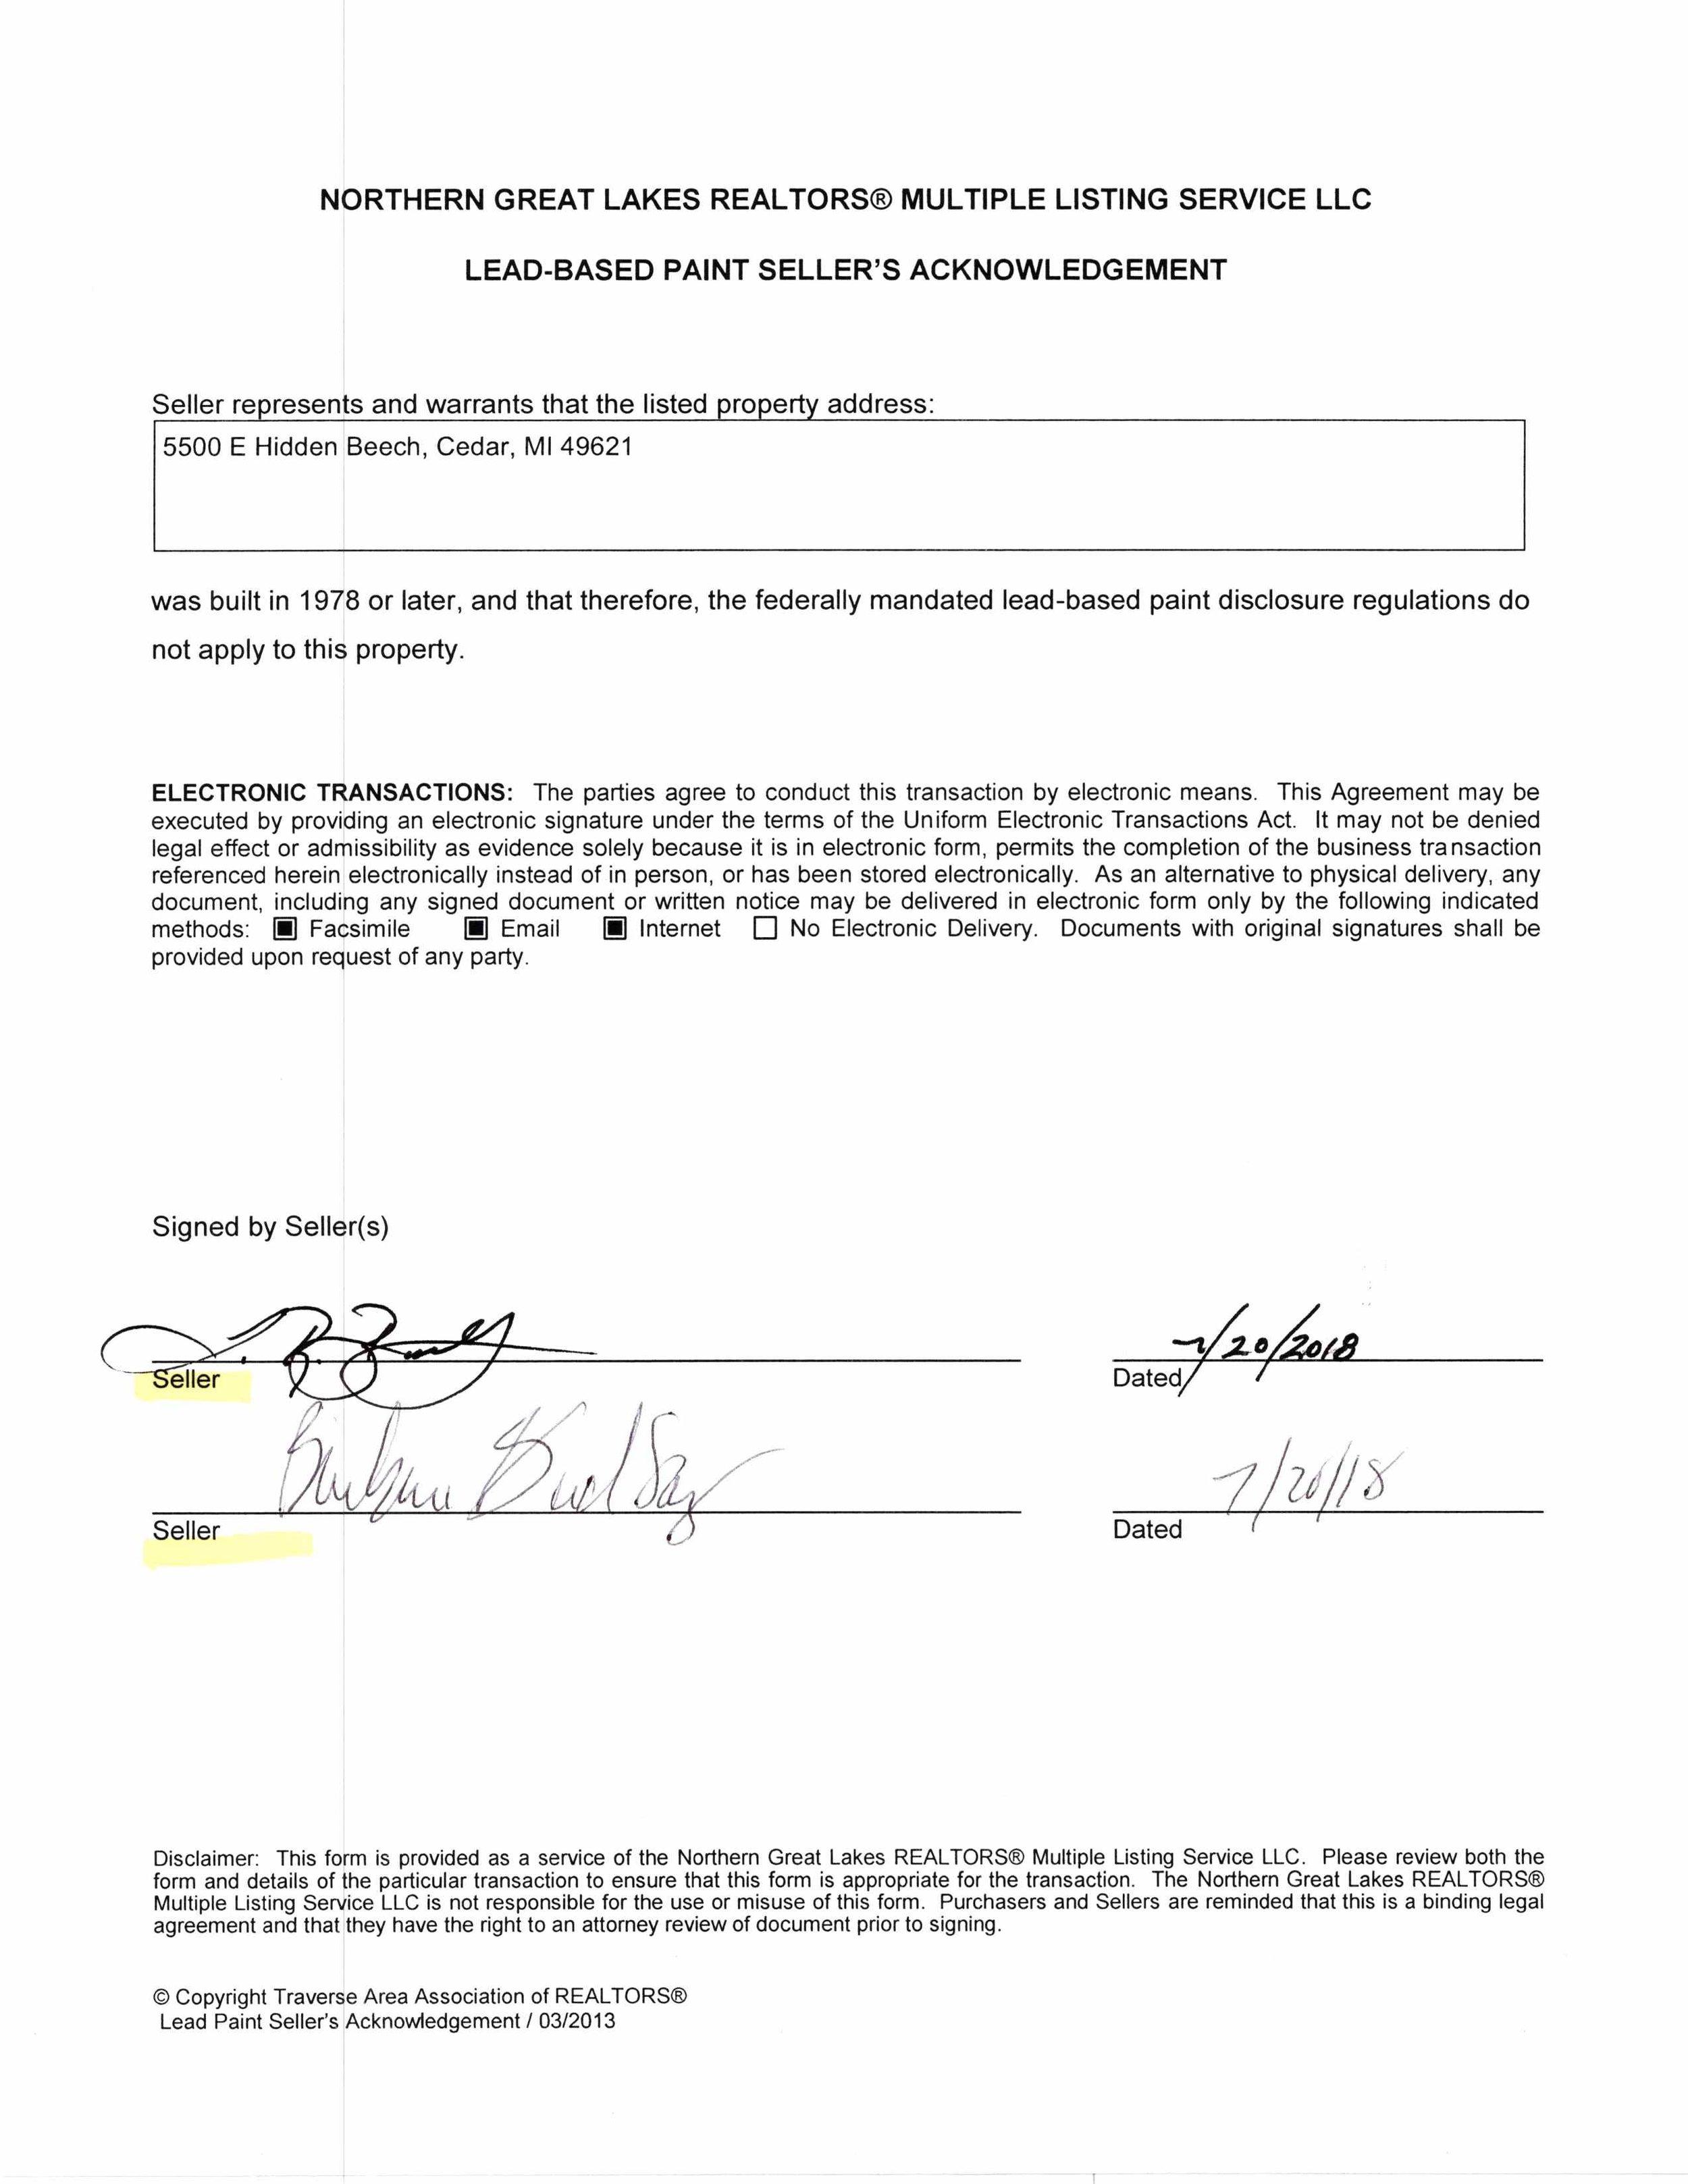 5500 E Hidden Beech, Cedar, MI - For sale by Oltersdorf Realty LLC - Marketing Packet (15).jpg